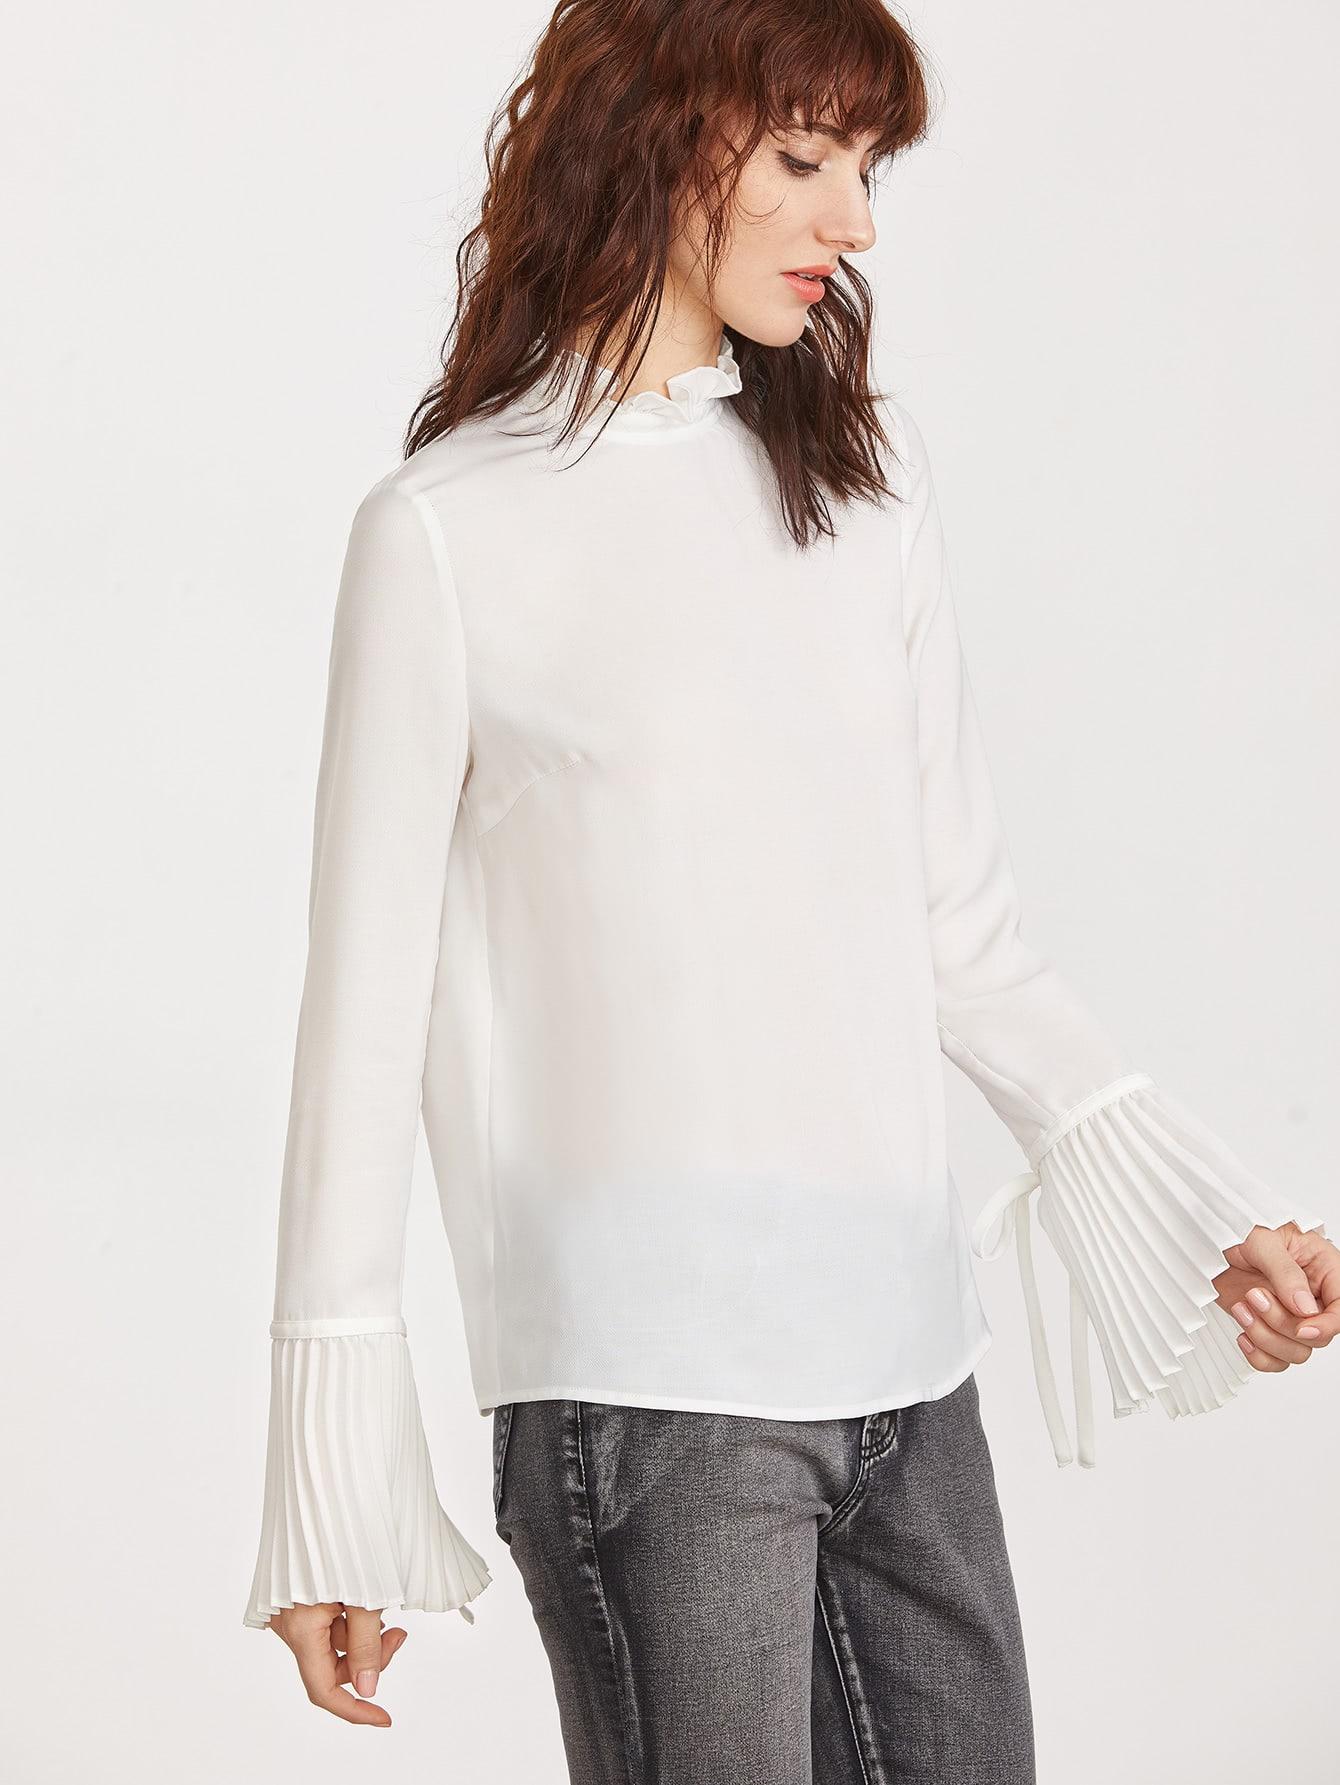 blouse161229704_2